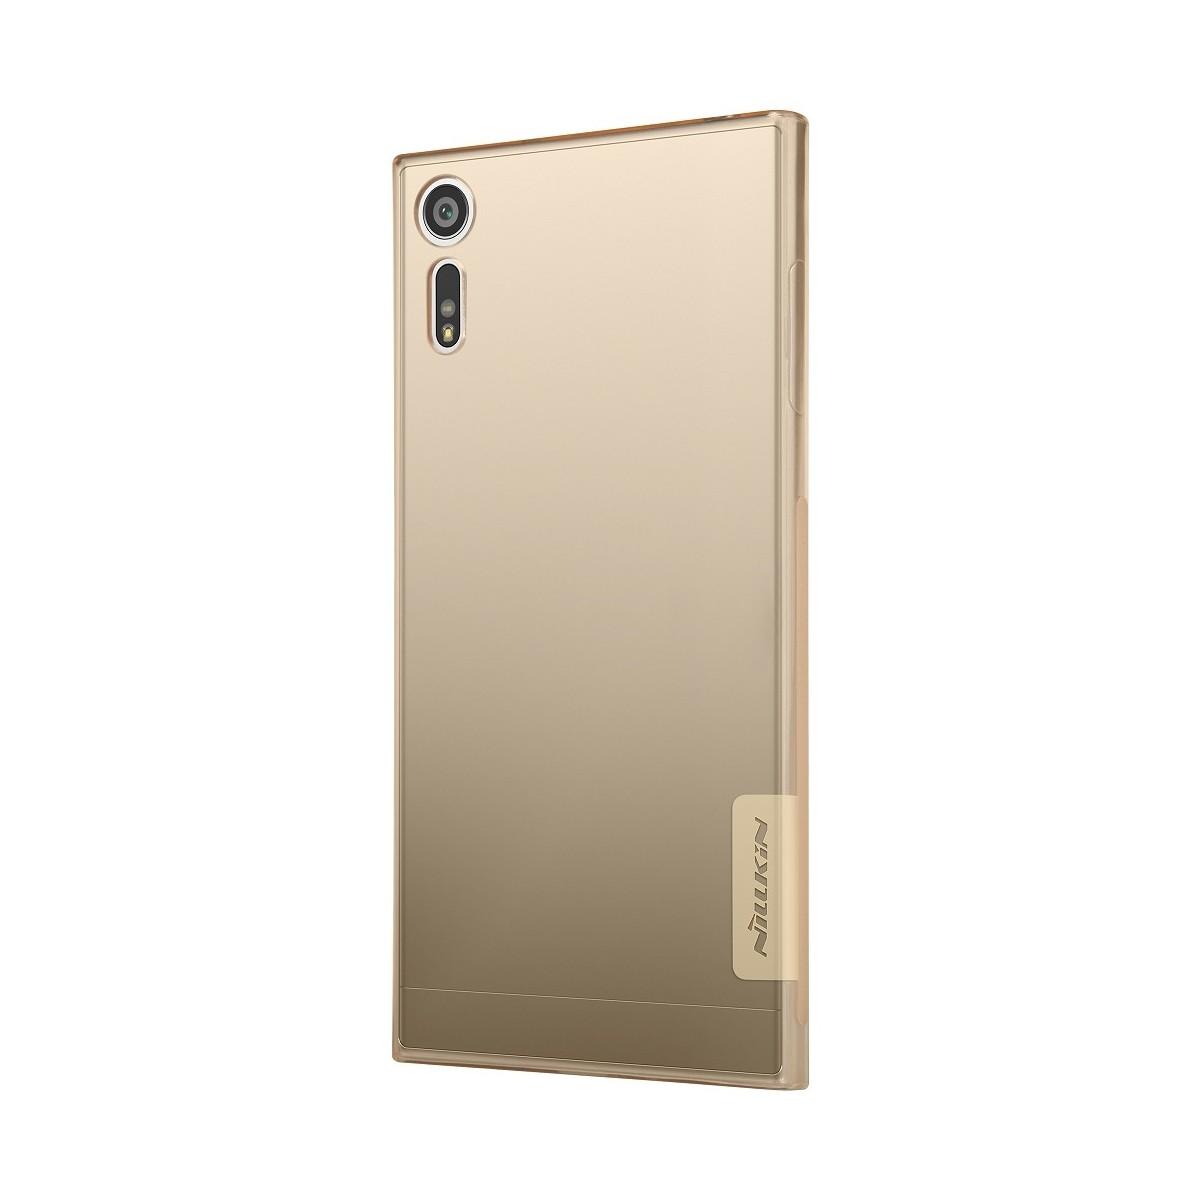 Coque Sony Xperia XZ Dorée Transparente souple - Nillkin